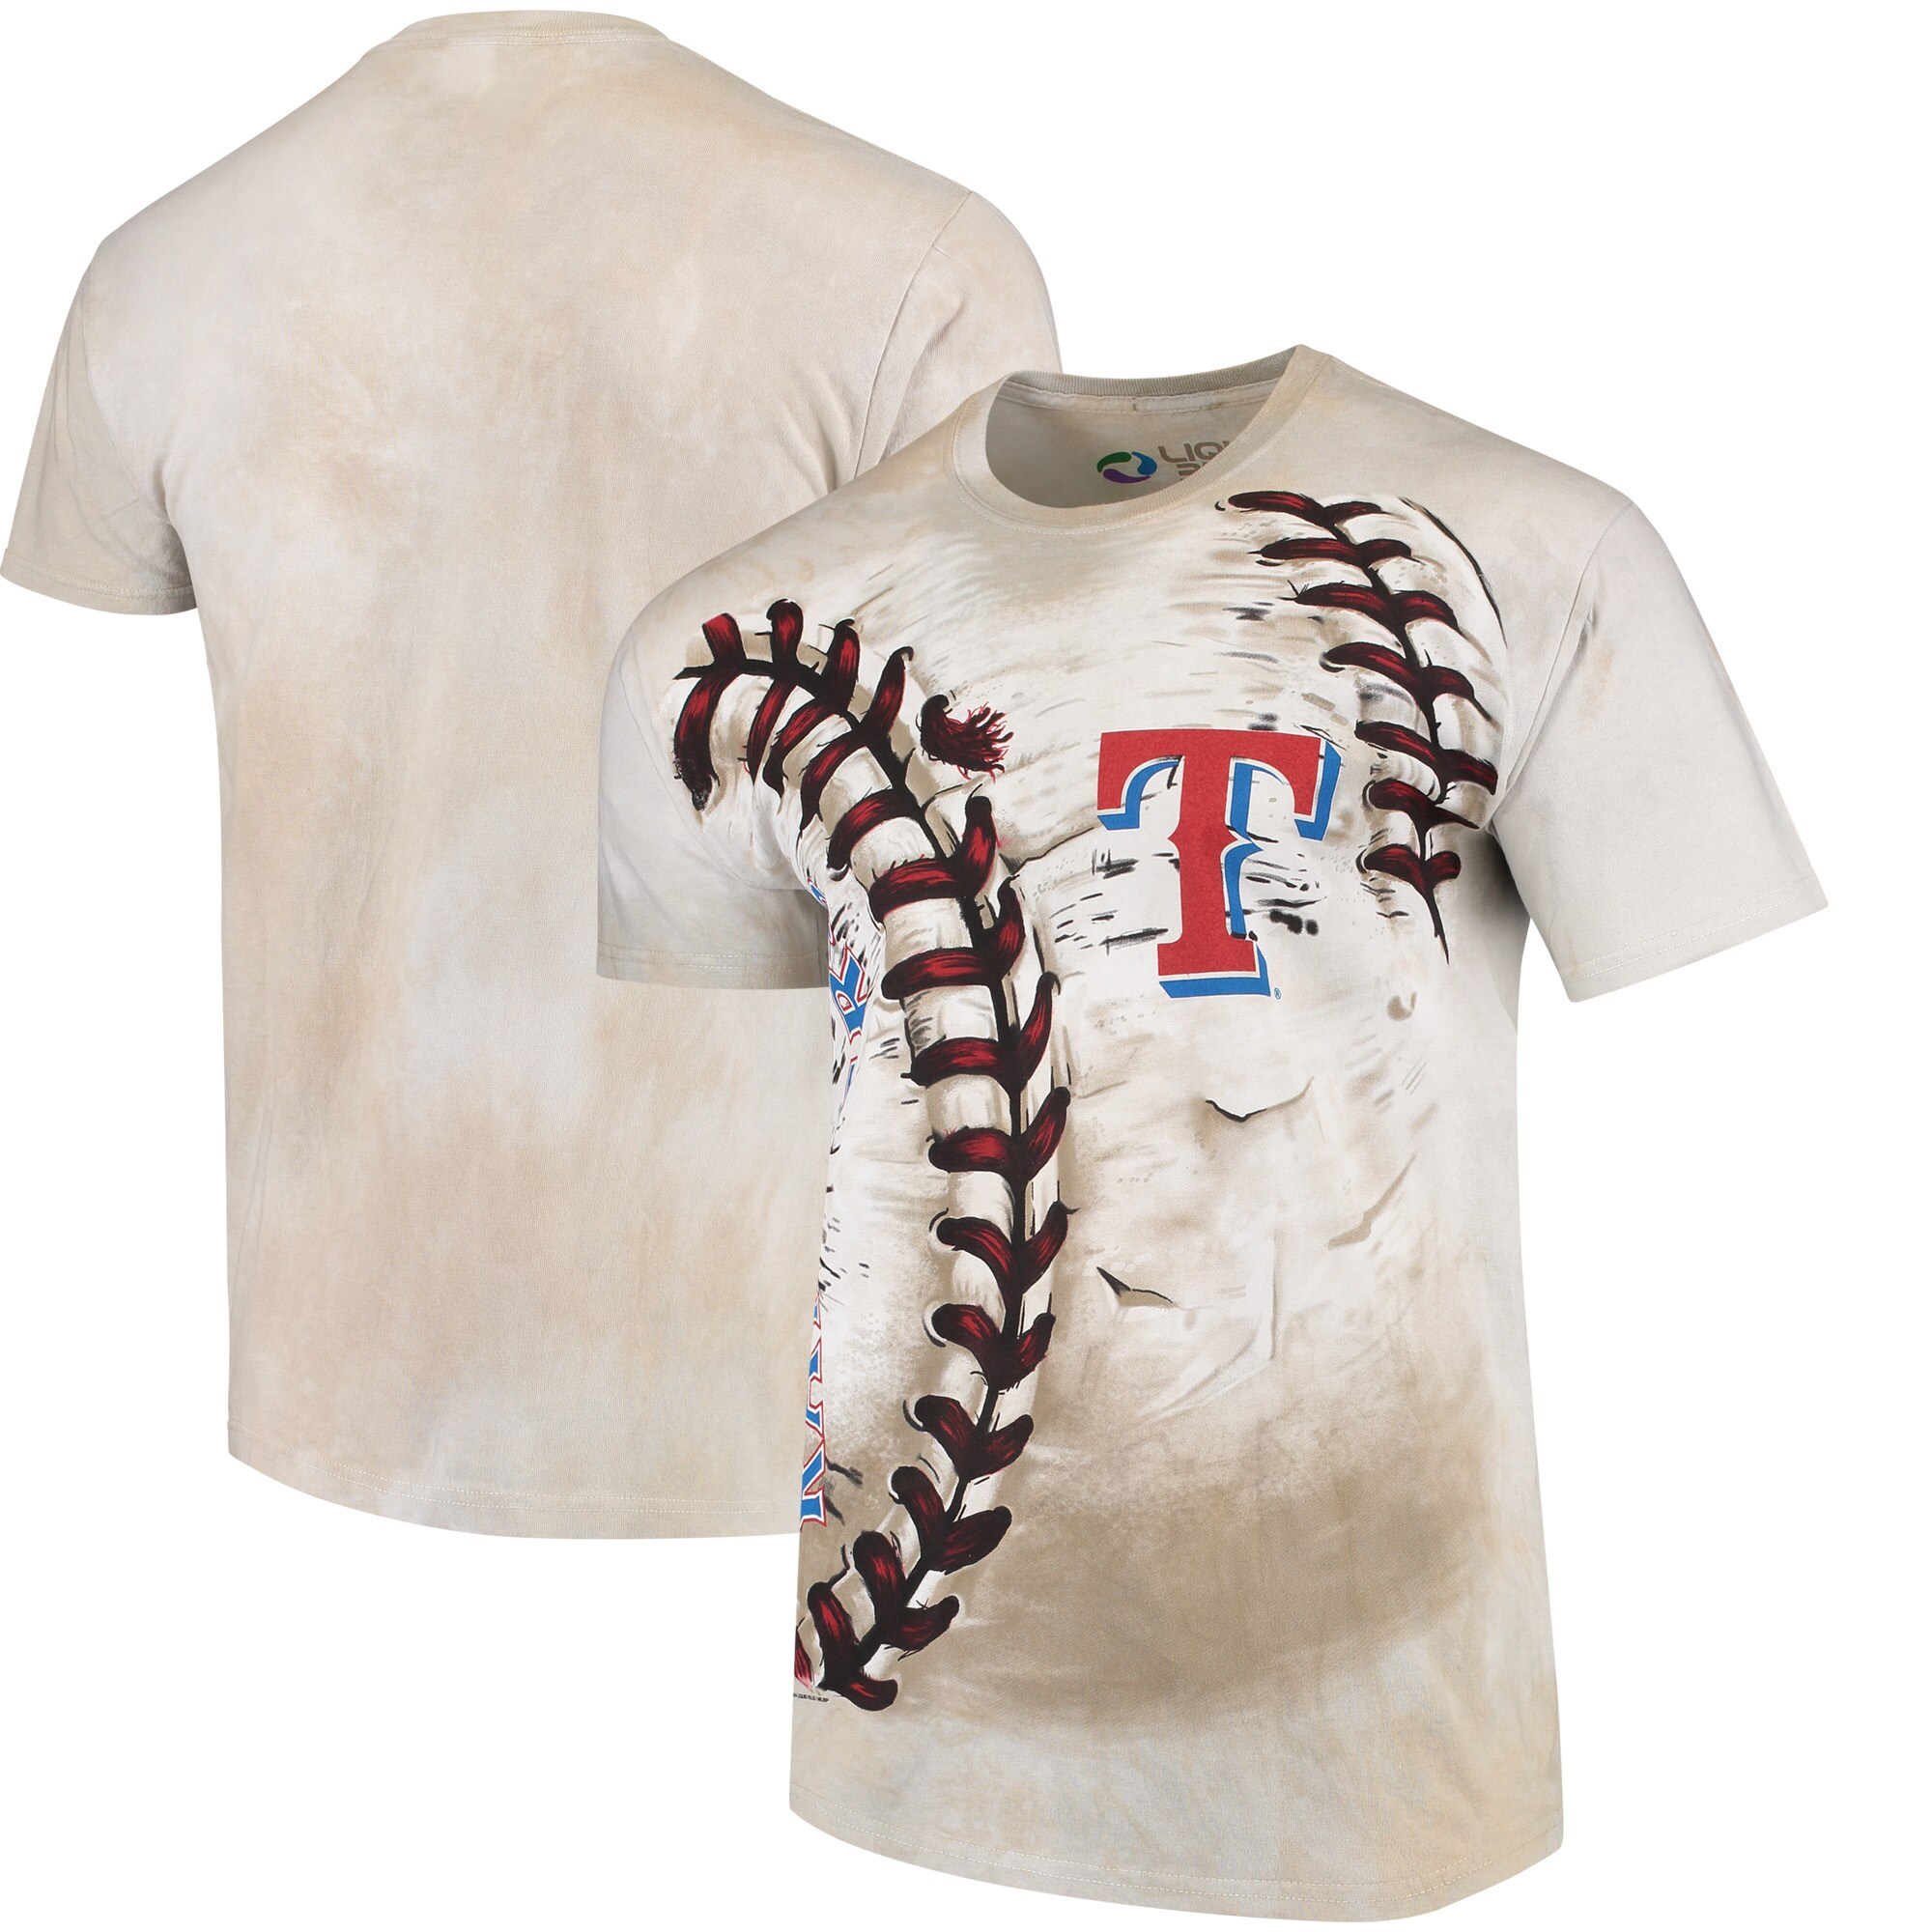 Texas Rangers Hardball Tie-Dye T- Shirt - Cream